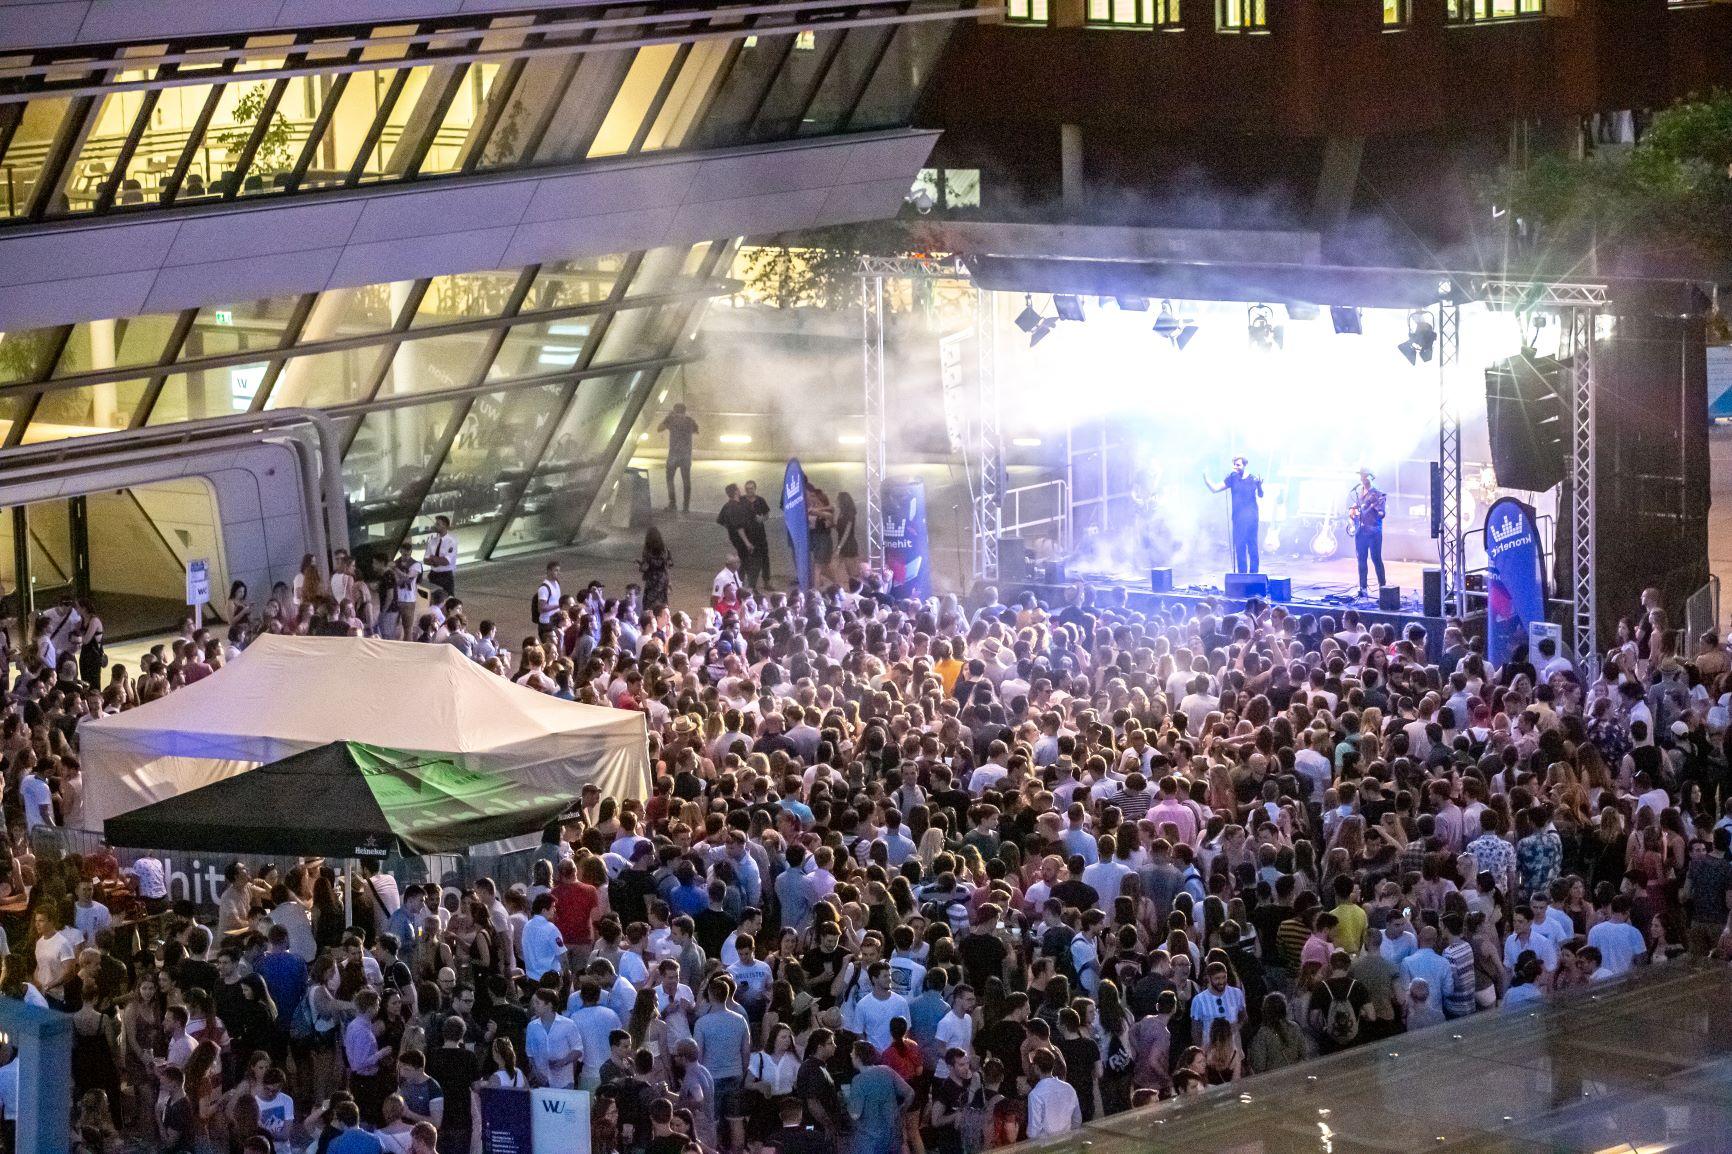 WU_Sommerfest_Bühne_M